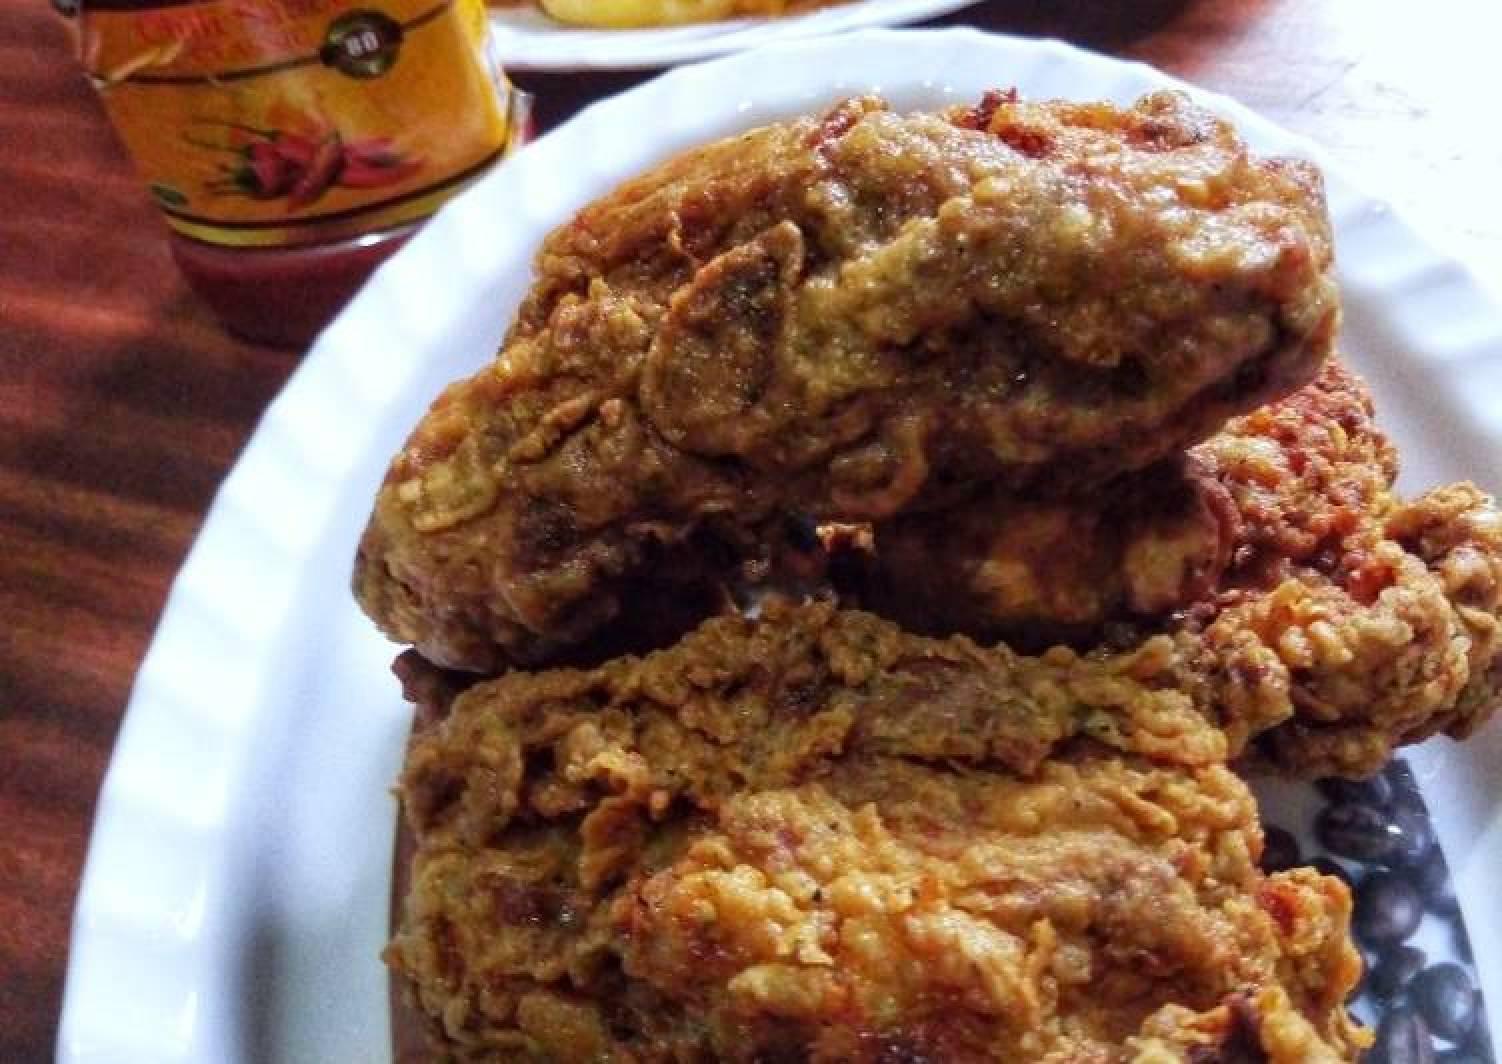 KFC style fried chicken #themechallenge